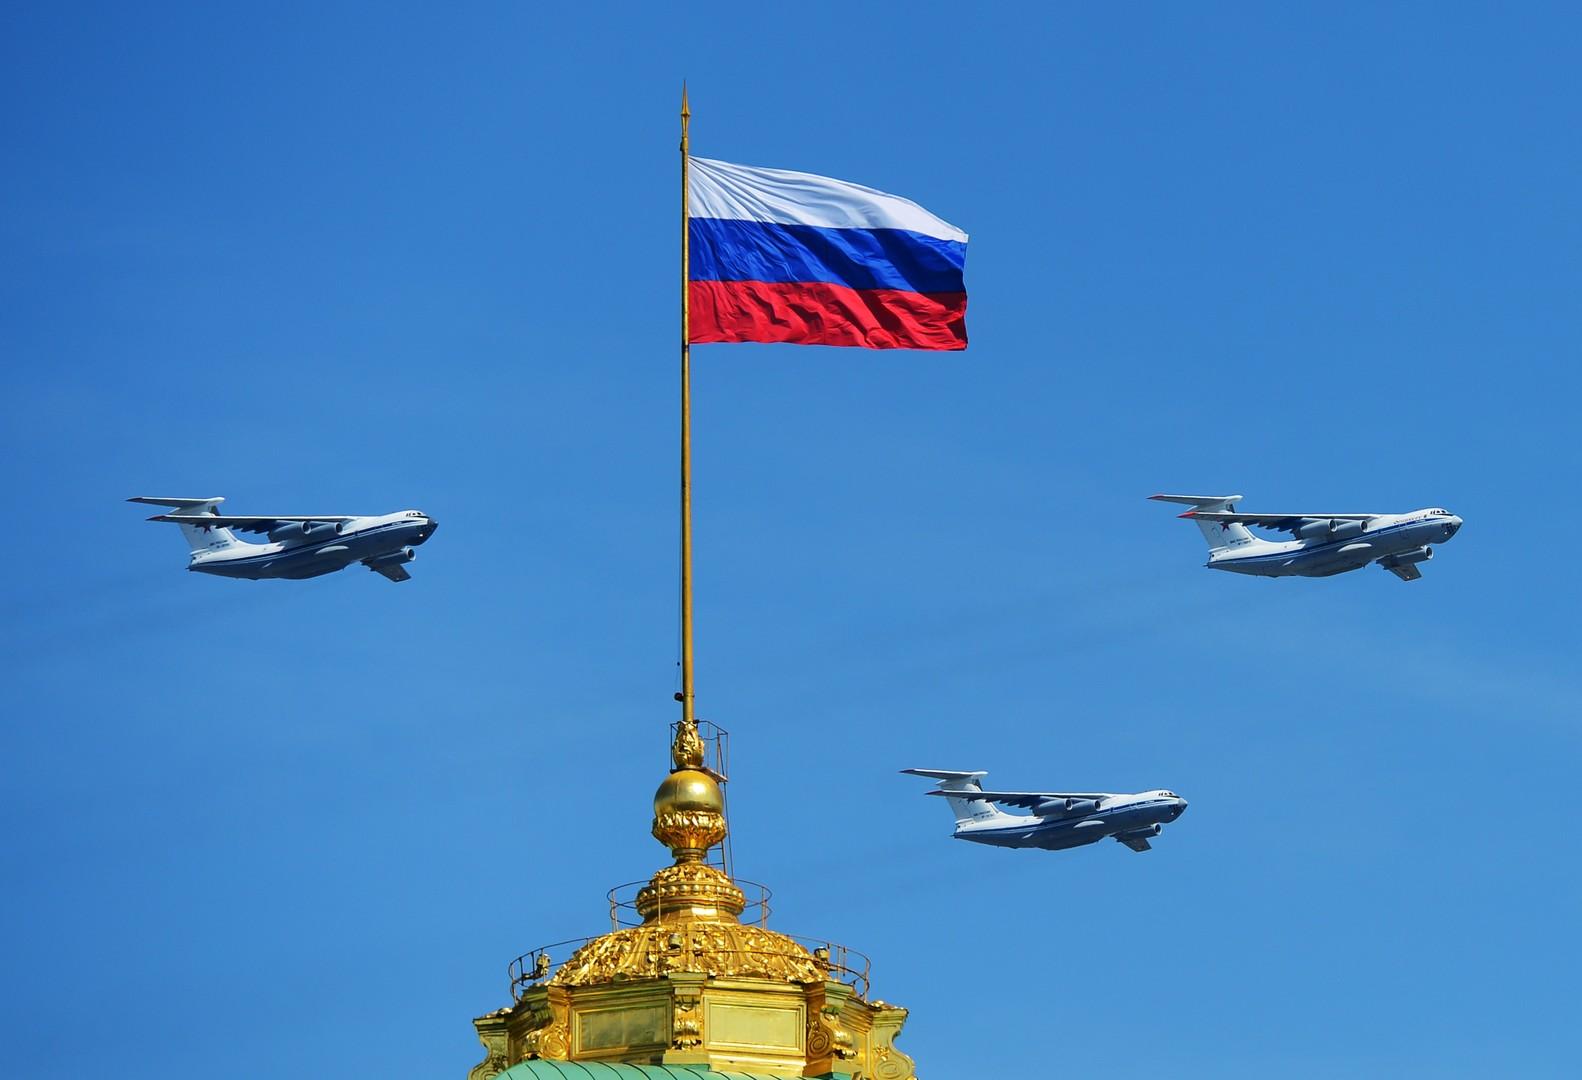 От ракет противника российские транспортники защитит «Президент»